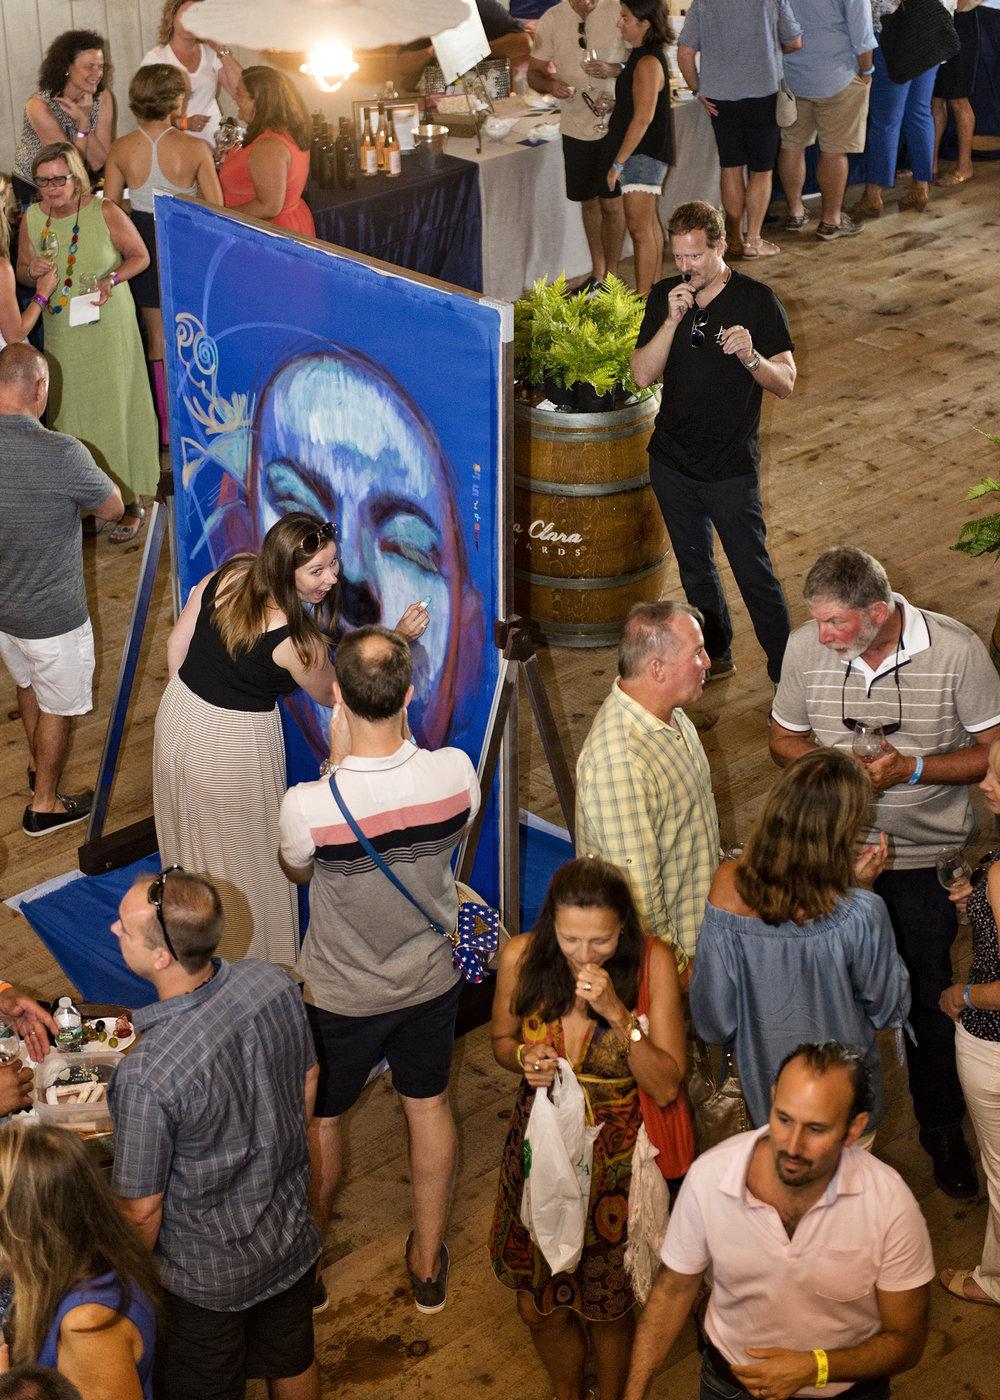 STYLE: Portrait | TITLE:Harvest Wine Festival